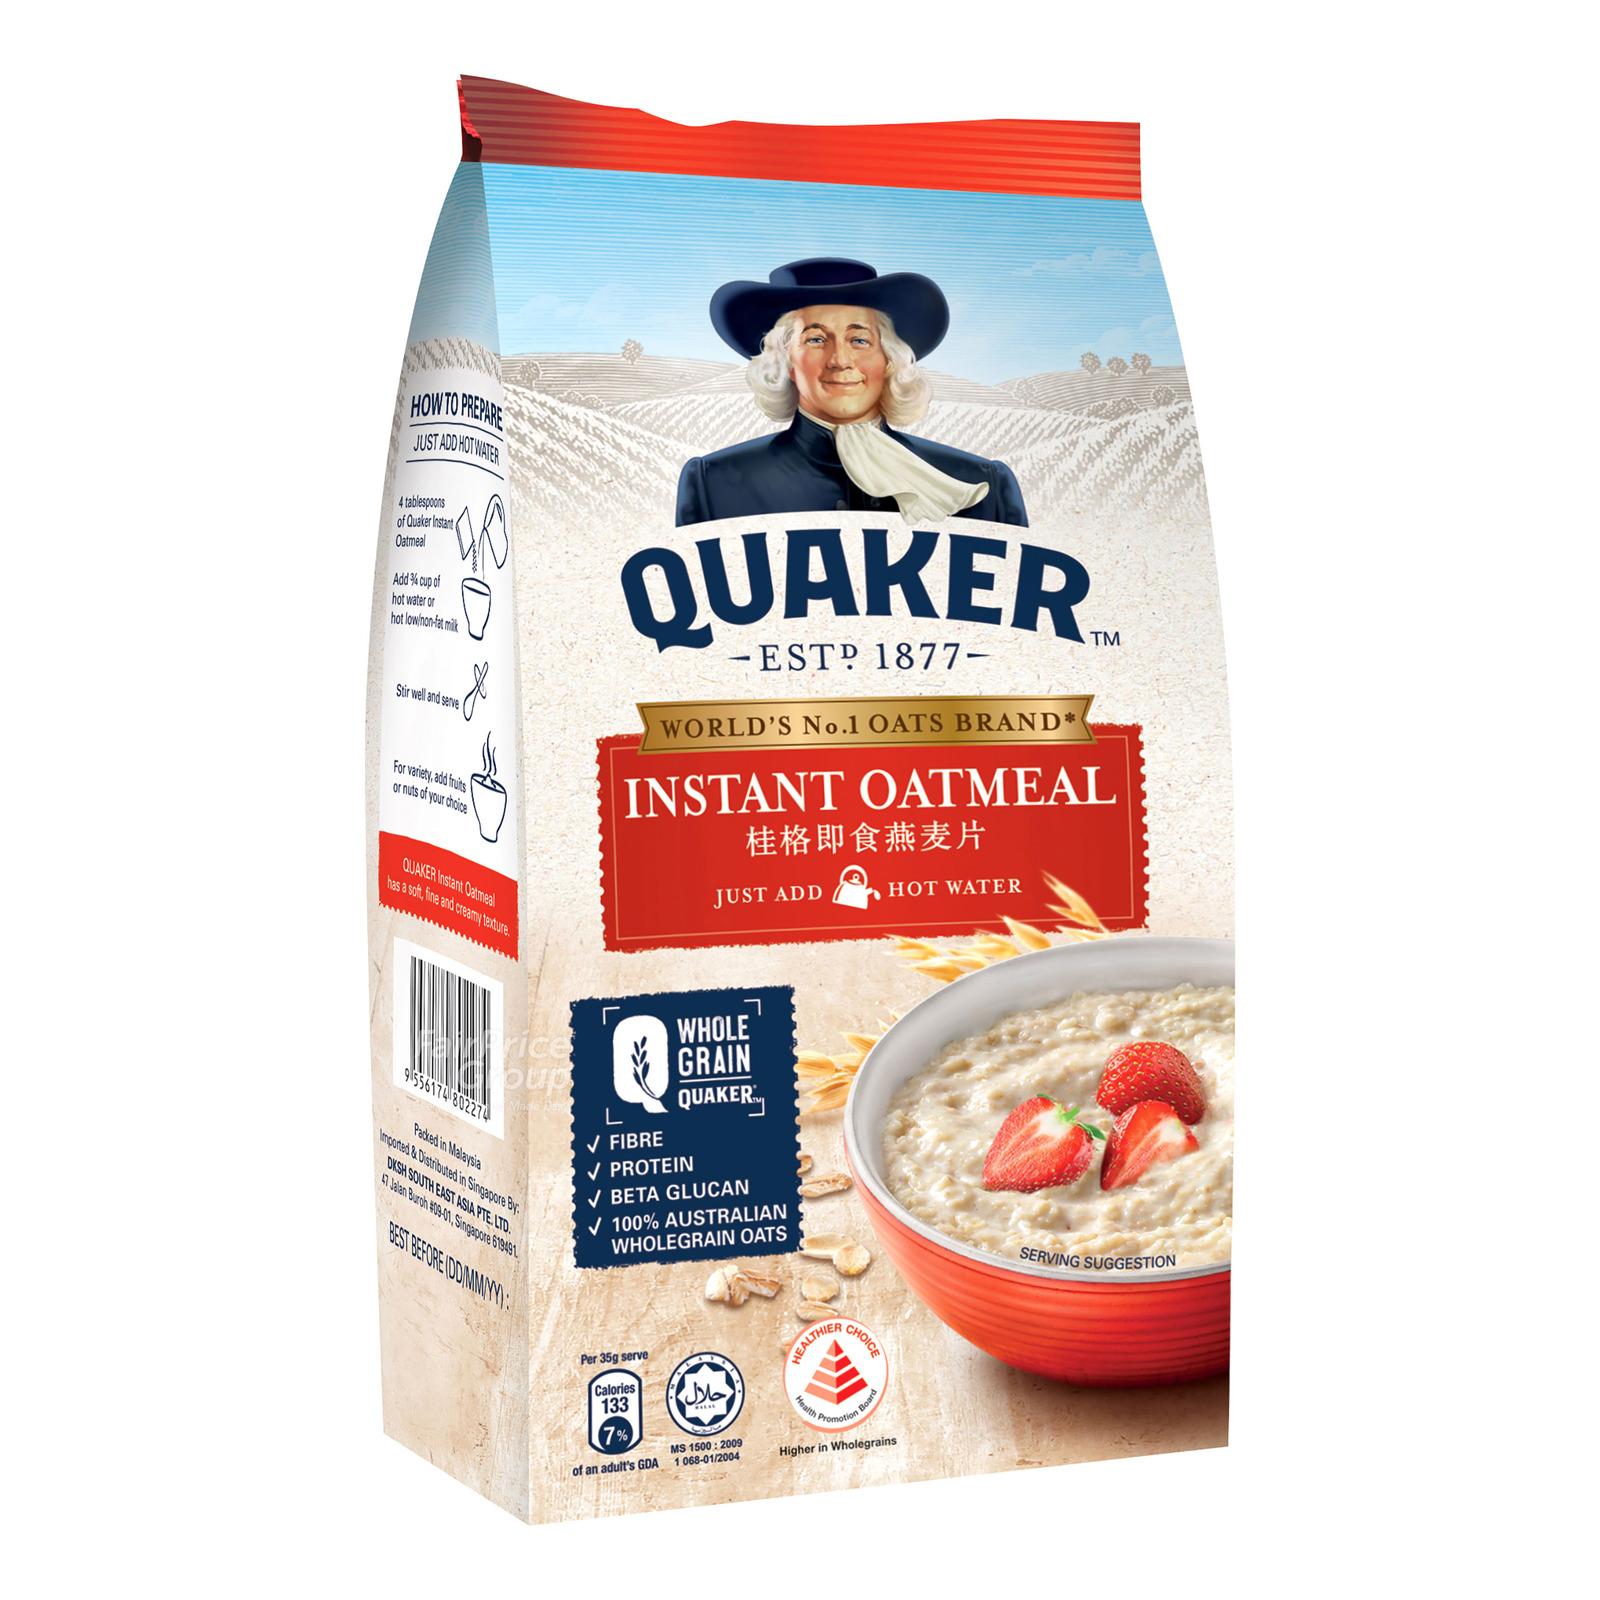 Quaker 100% Wholegrain Oatmeal Refill - Instant